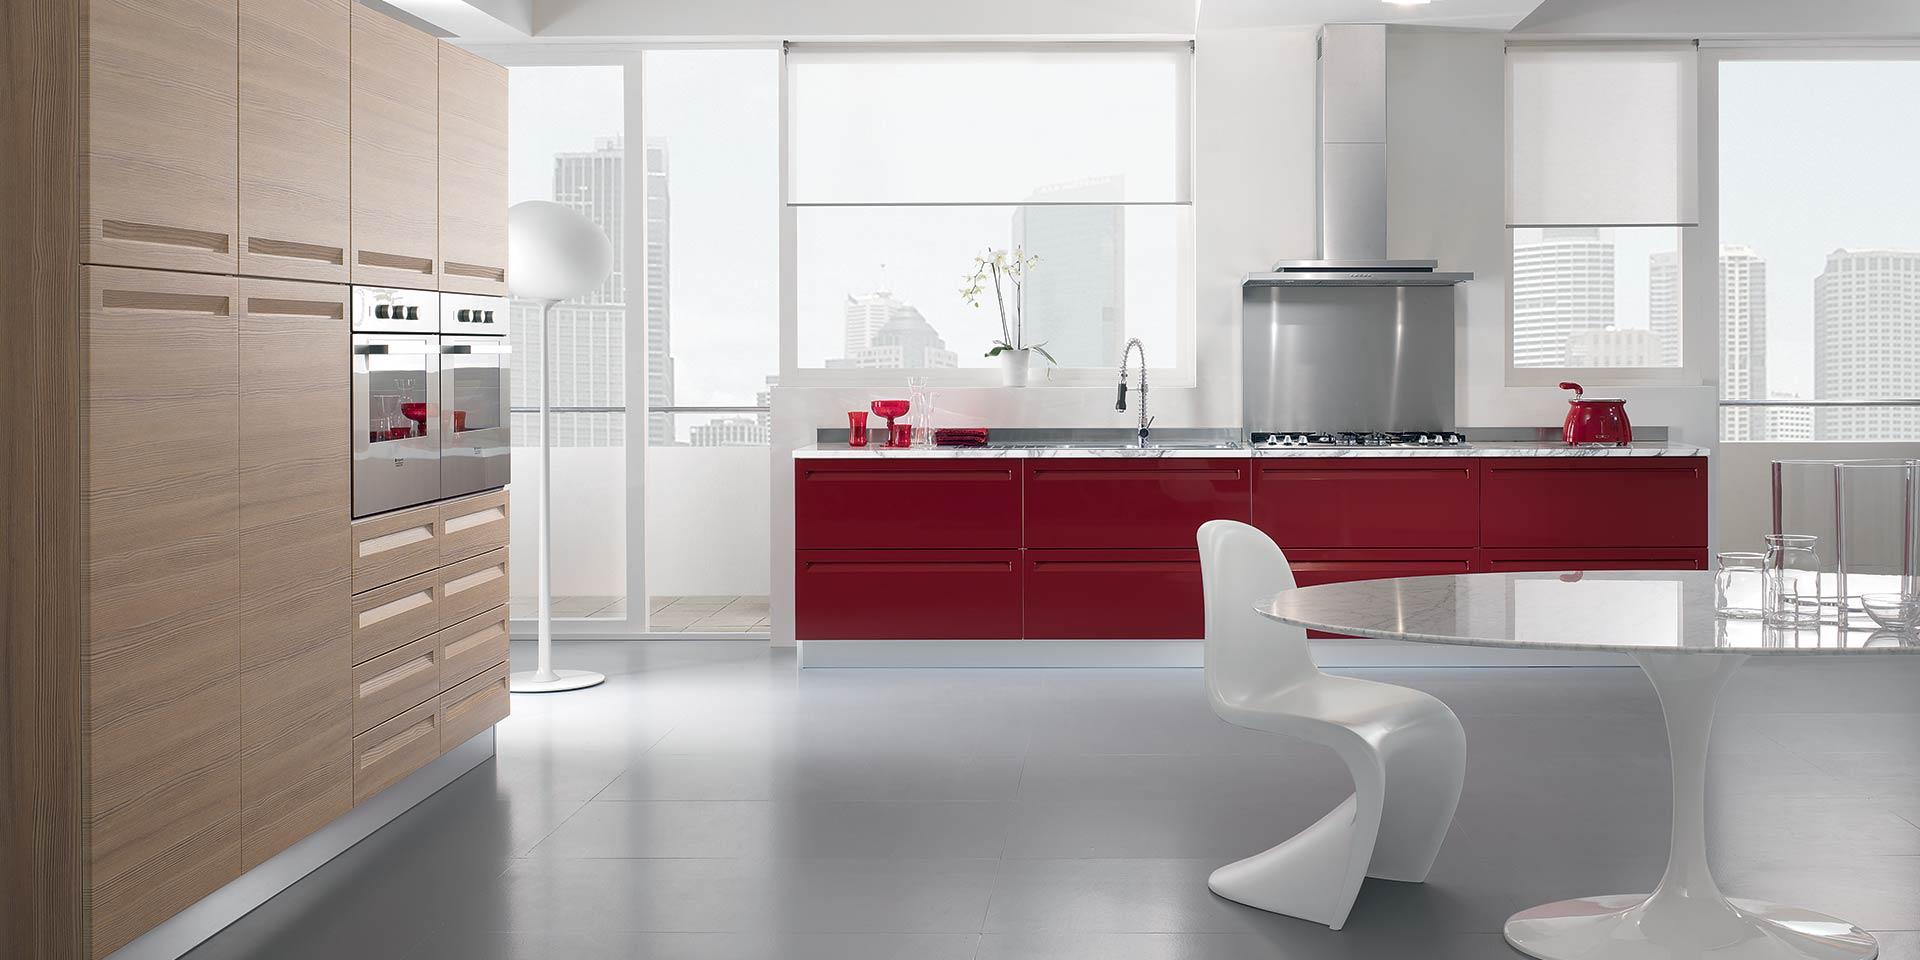 Cucine componibili moderne cucine vetrocucina con isola - Spar cucine moderne prezzi ...